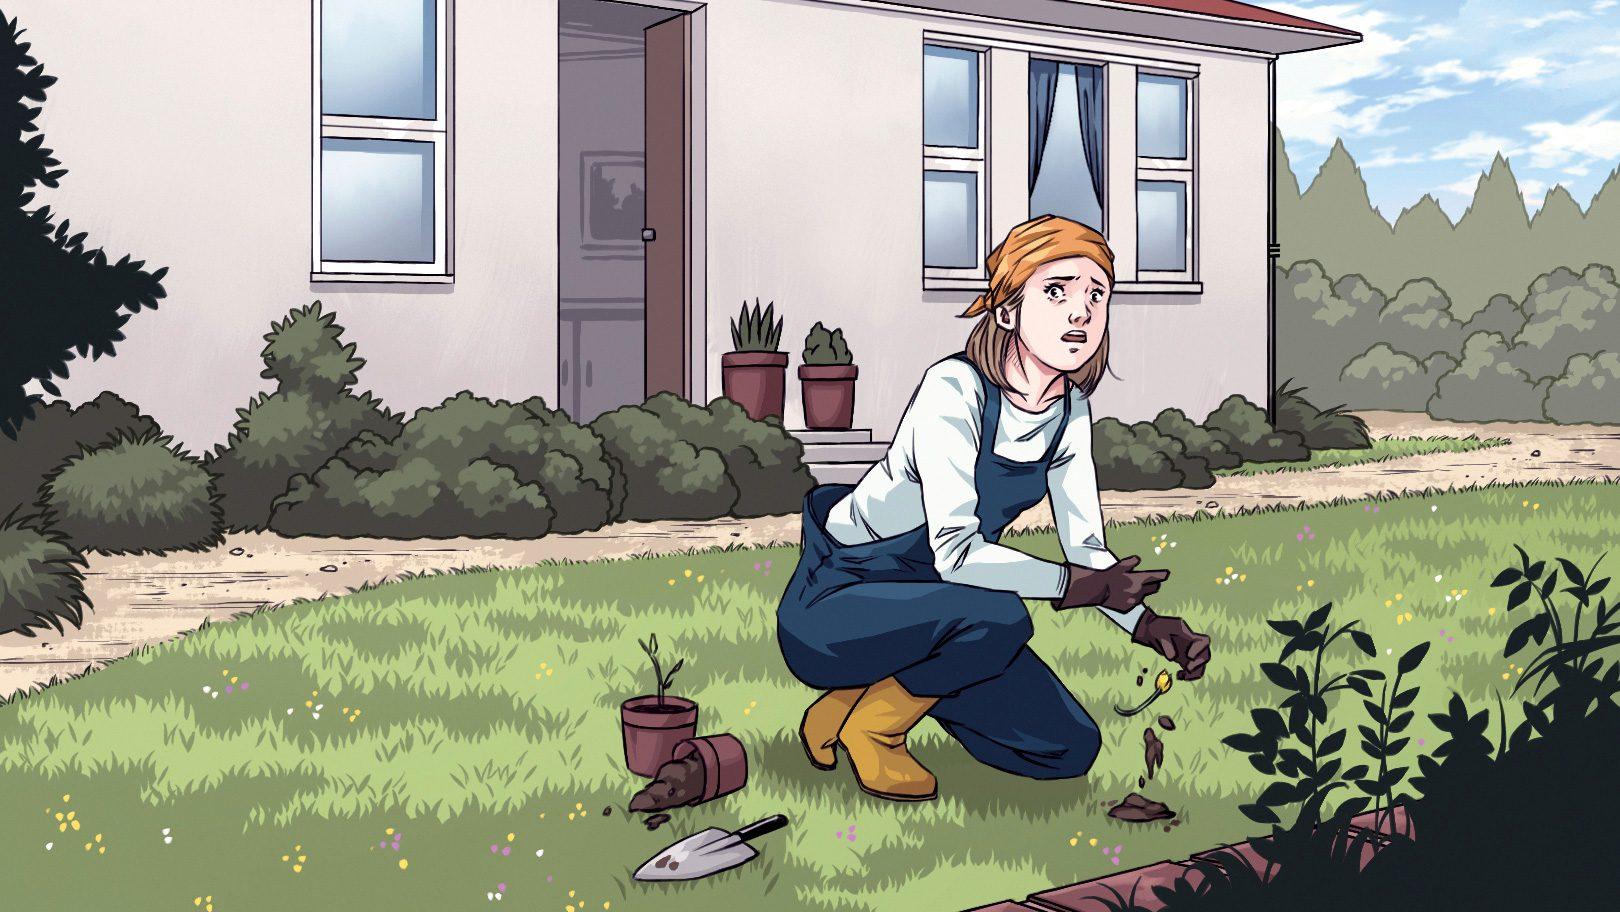 illustration; woman doing yardwork senses something is wrong